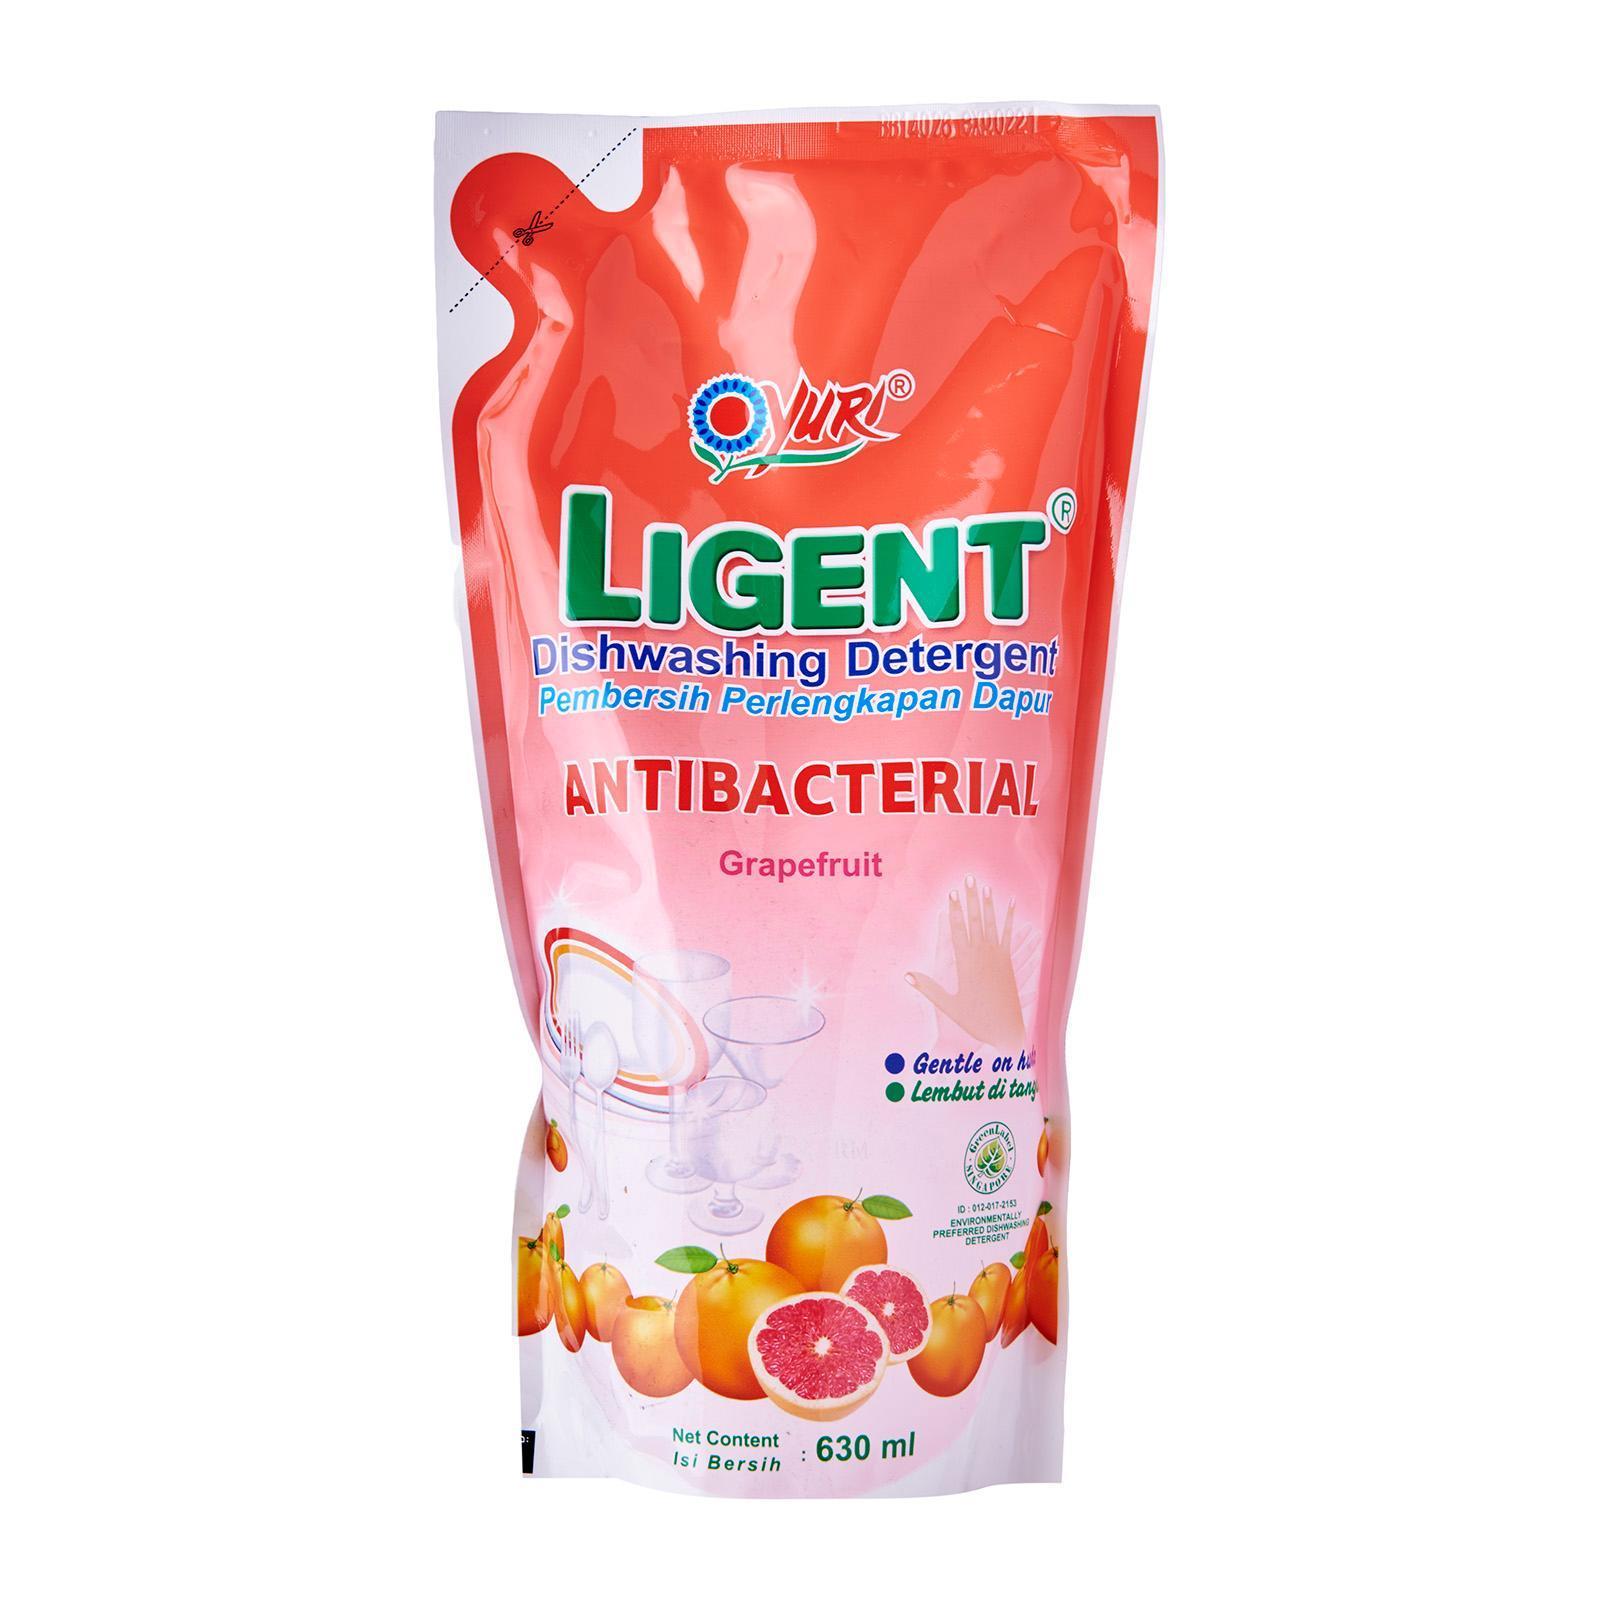 Yuri Ligent Refill Grape Fruit Dishwashing Detergent. 630 ml